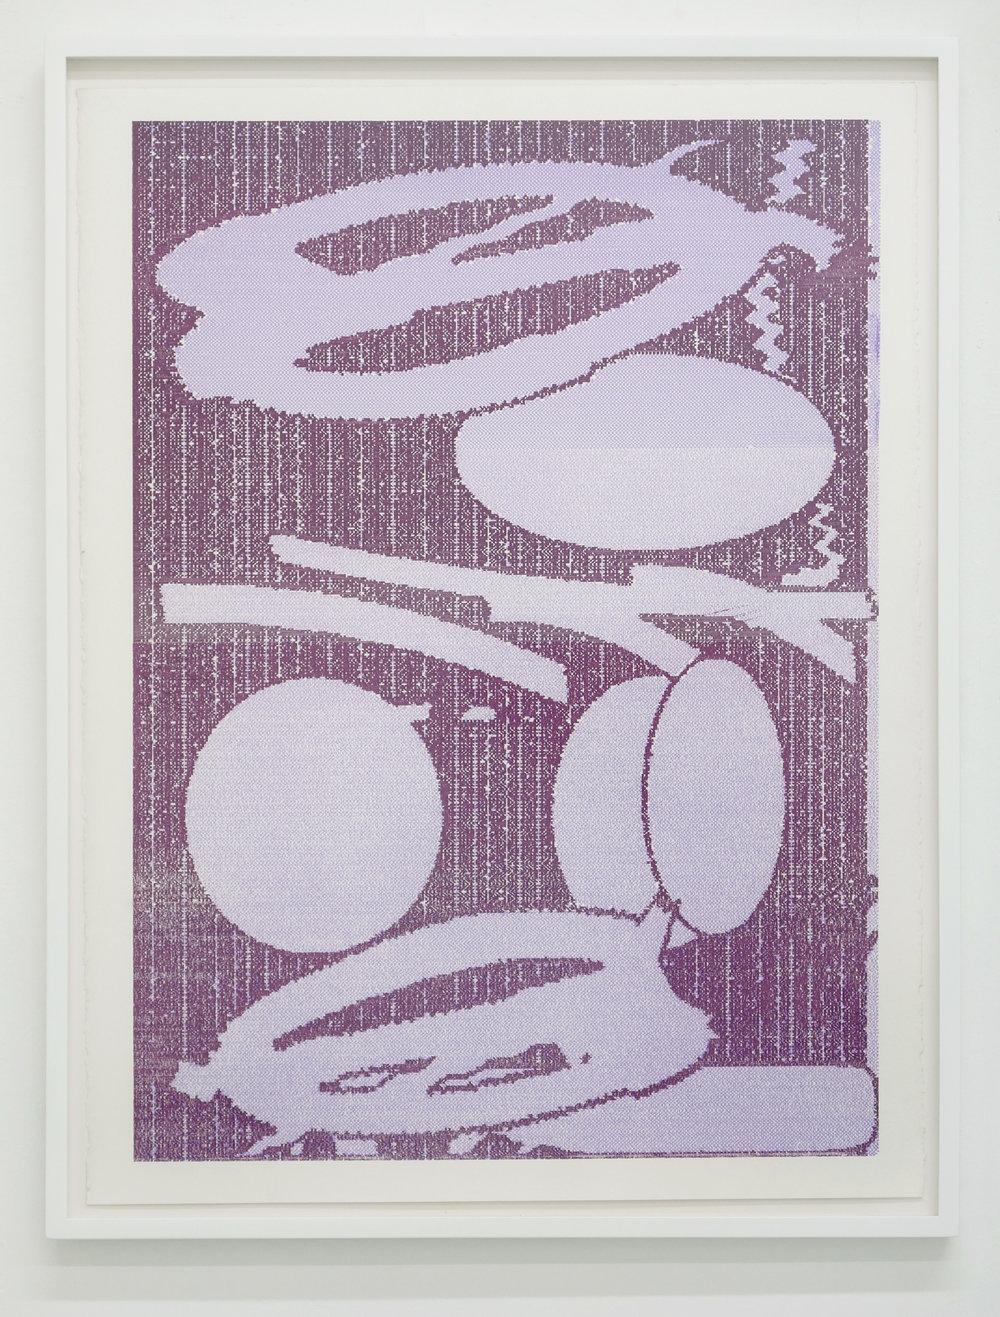 Natan Lawson lg purple drawing.jpg